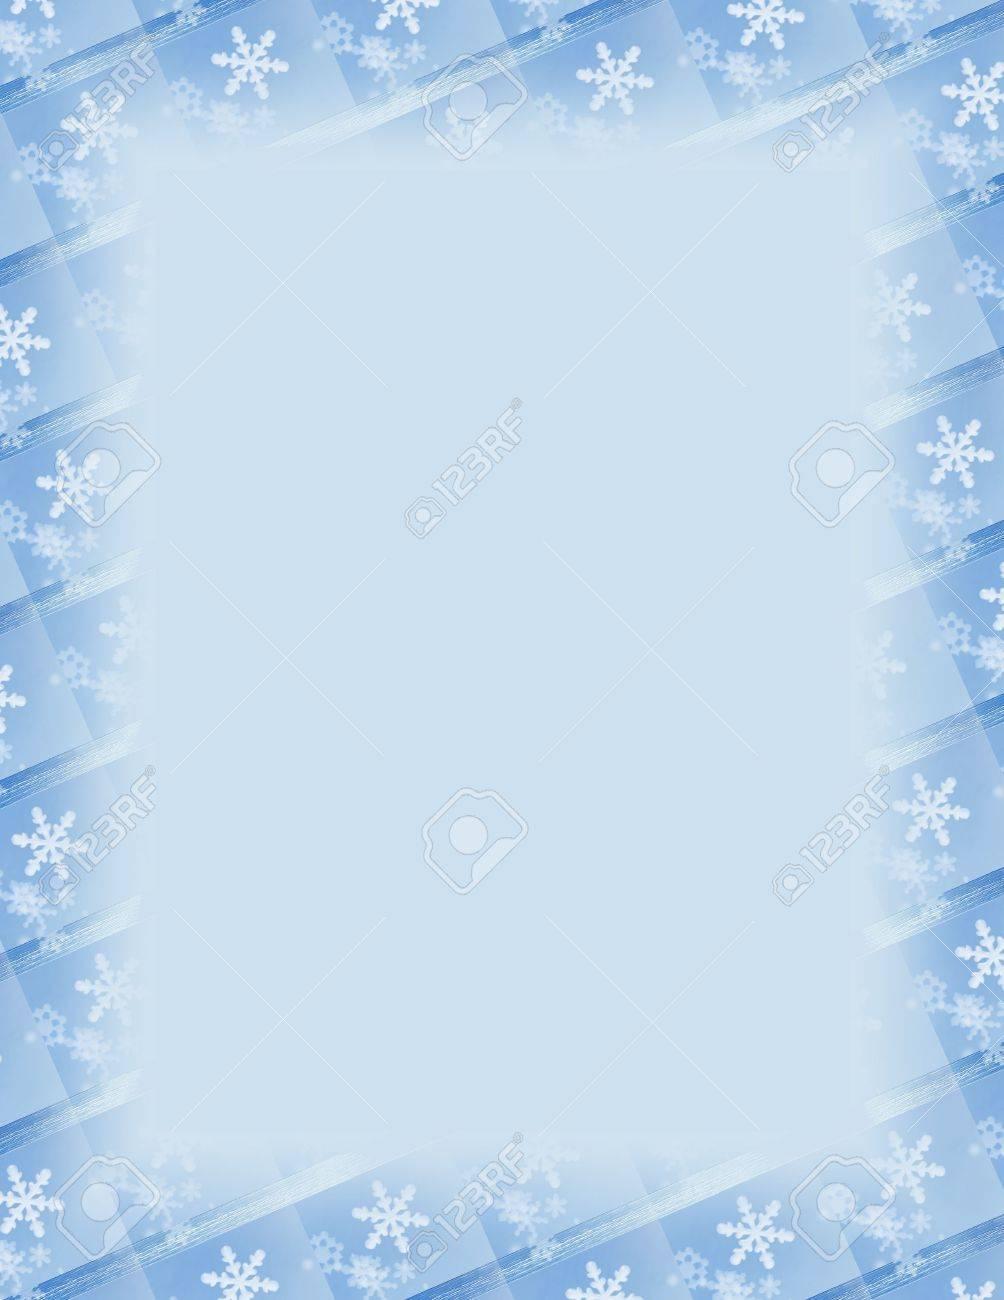 blue and white border over blue snowflake theme stock photo